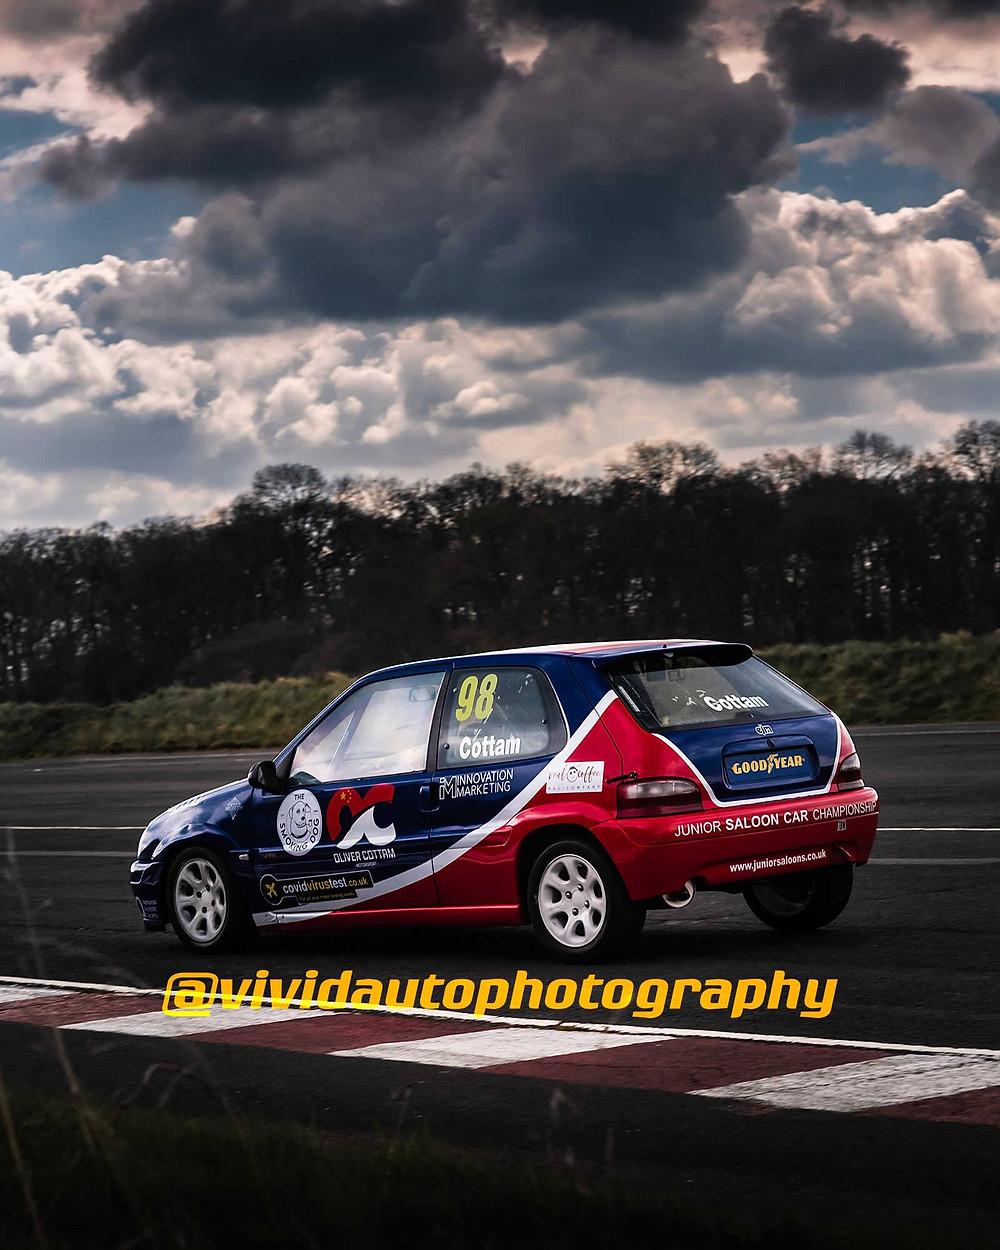 Citroen Saxo   Oliver Cottham   Stafford Driving Centre